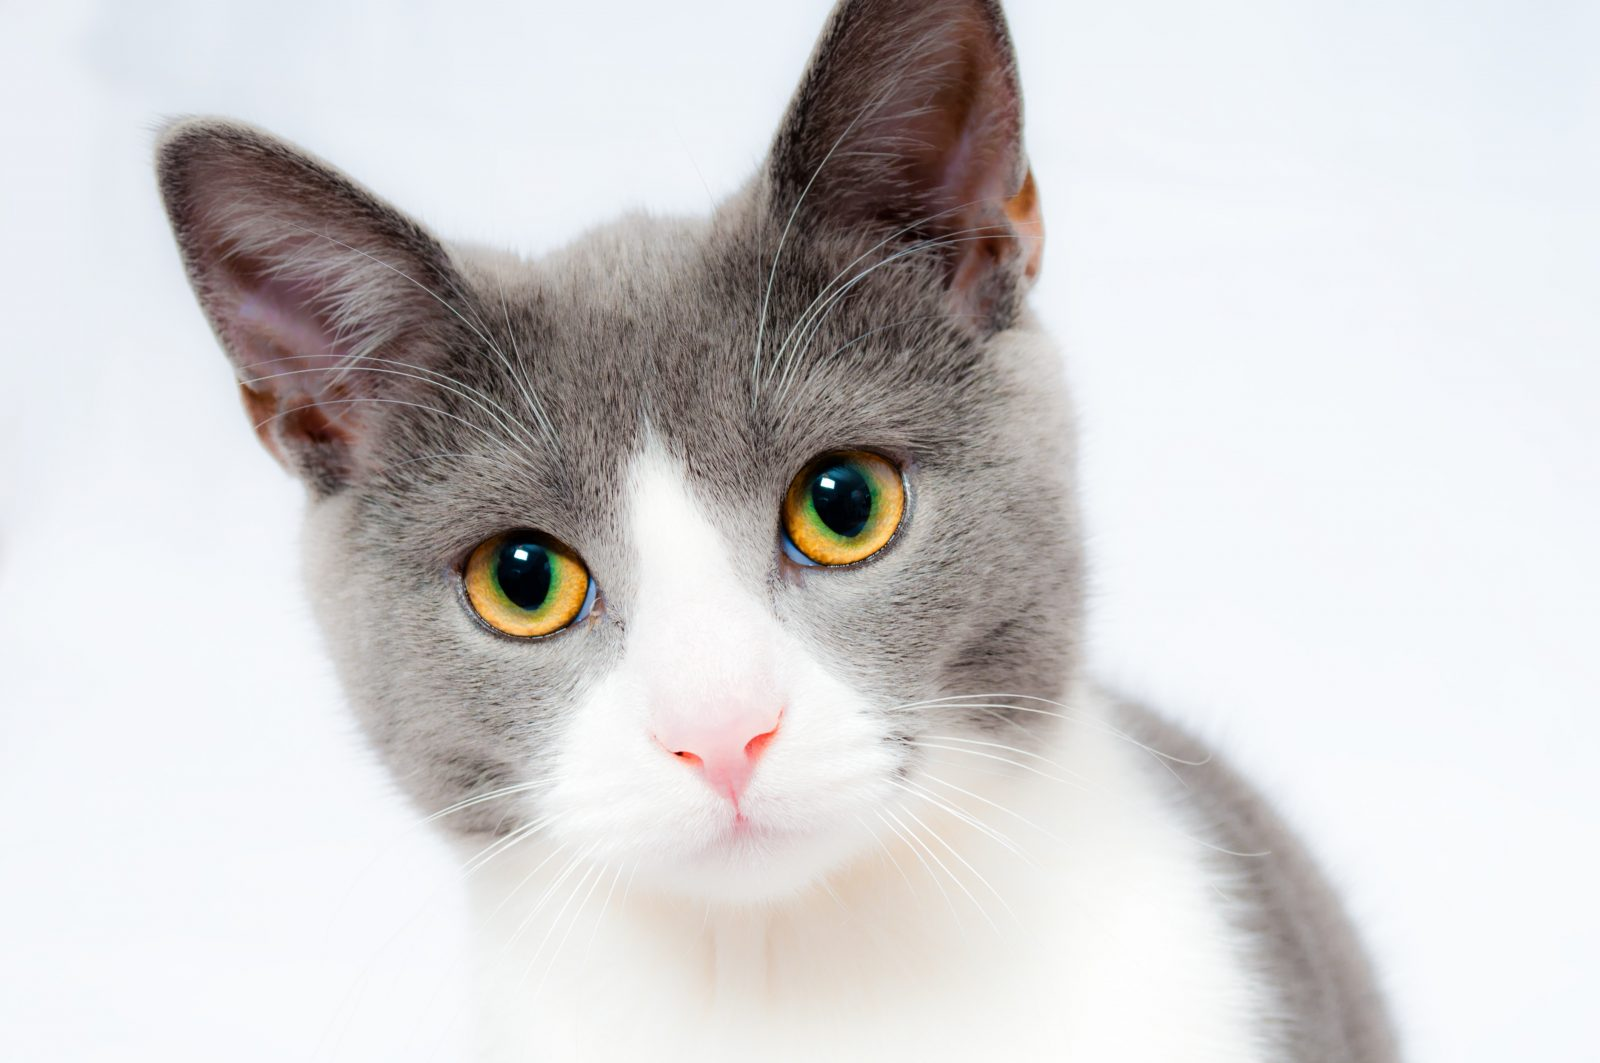 pexels pixabay 104827 - Tenho um Gato Soro Positivo...